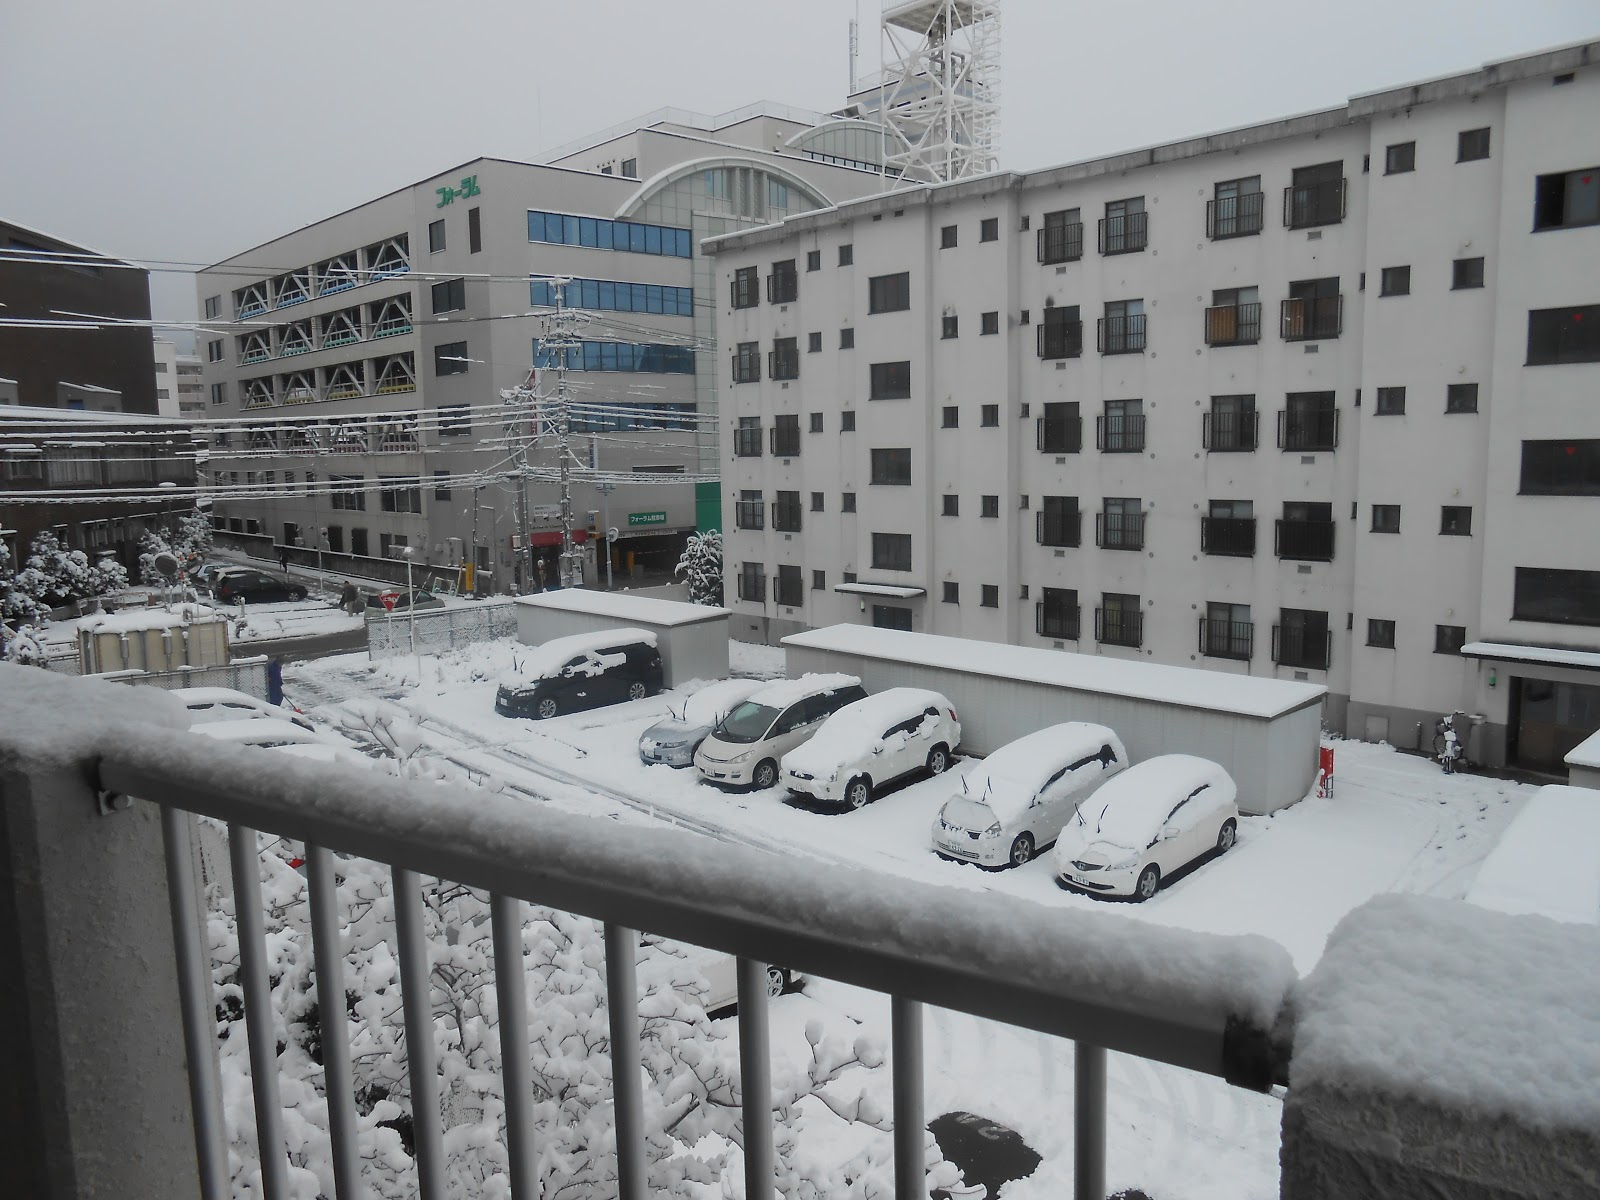 yamagata weather